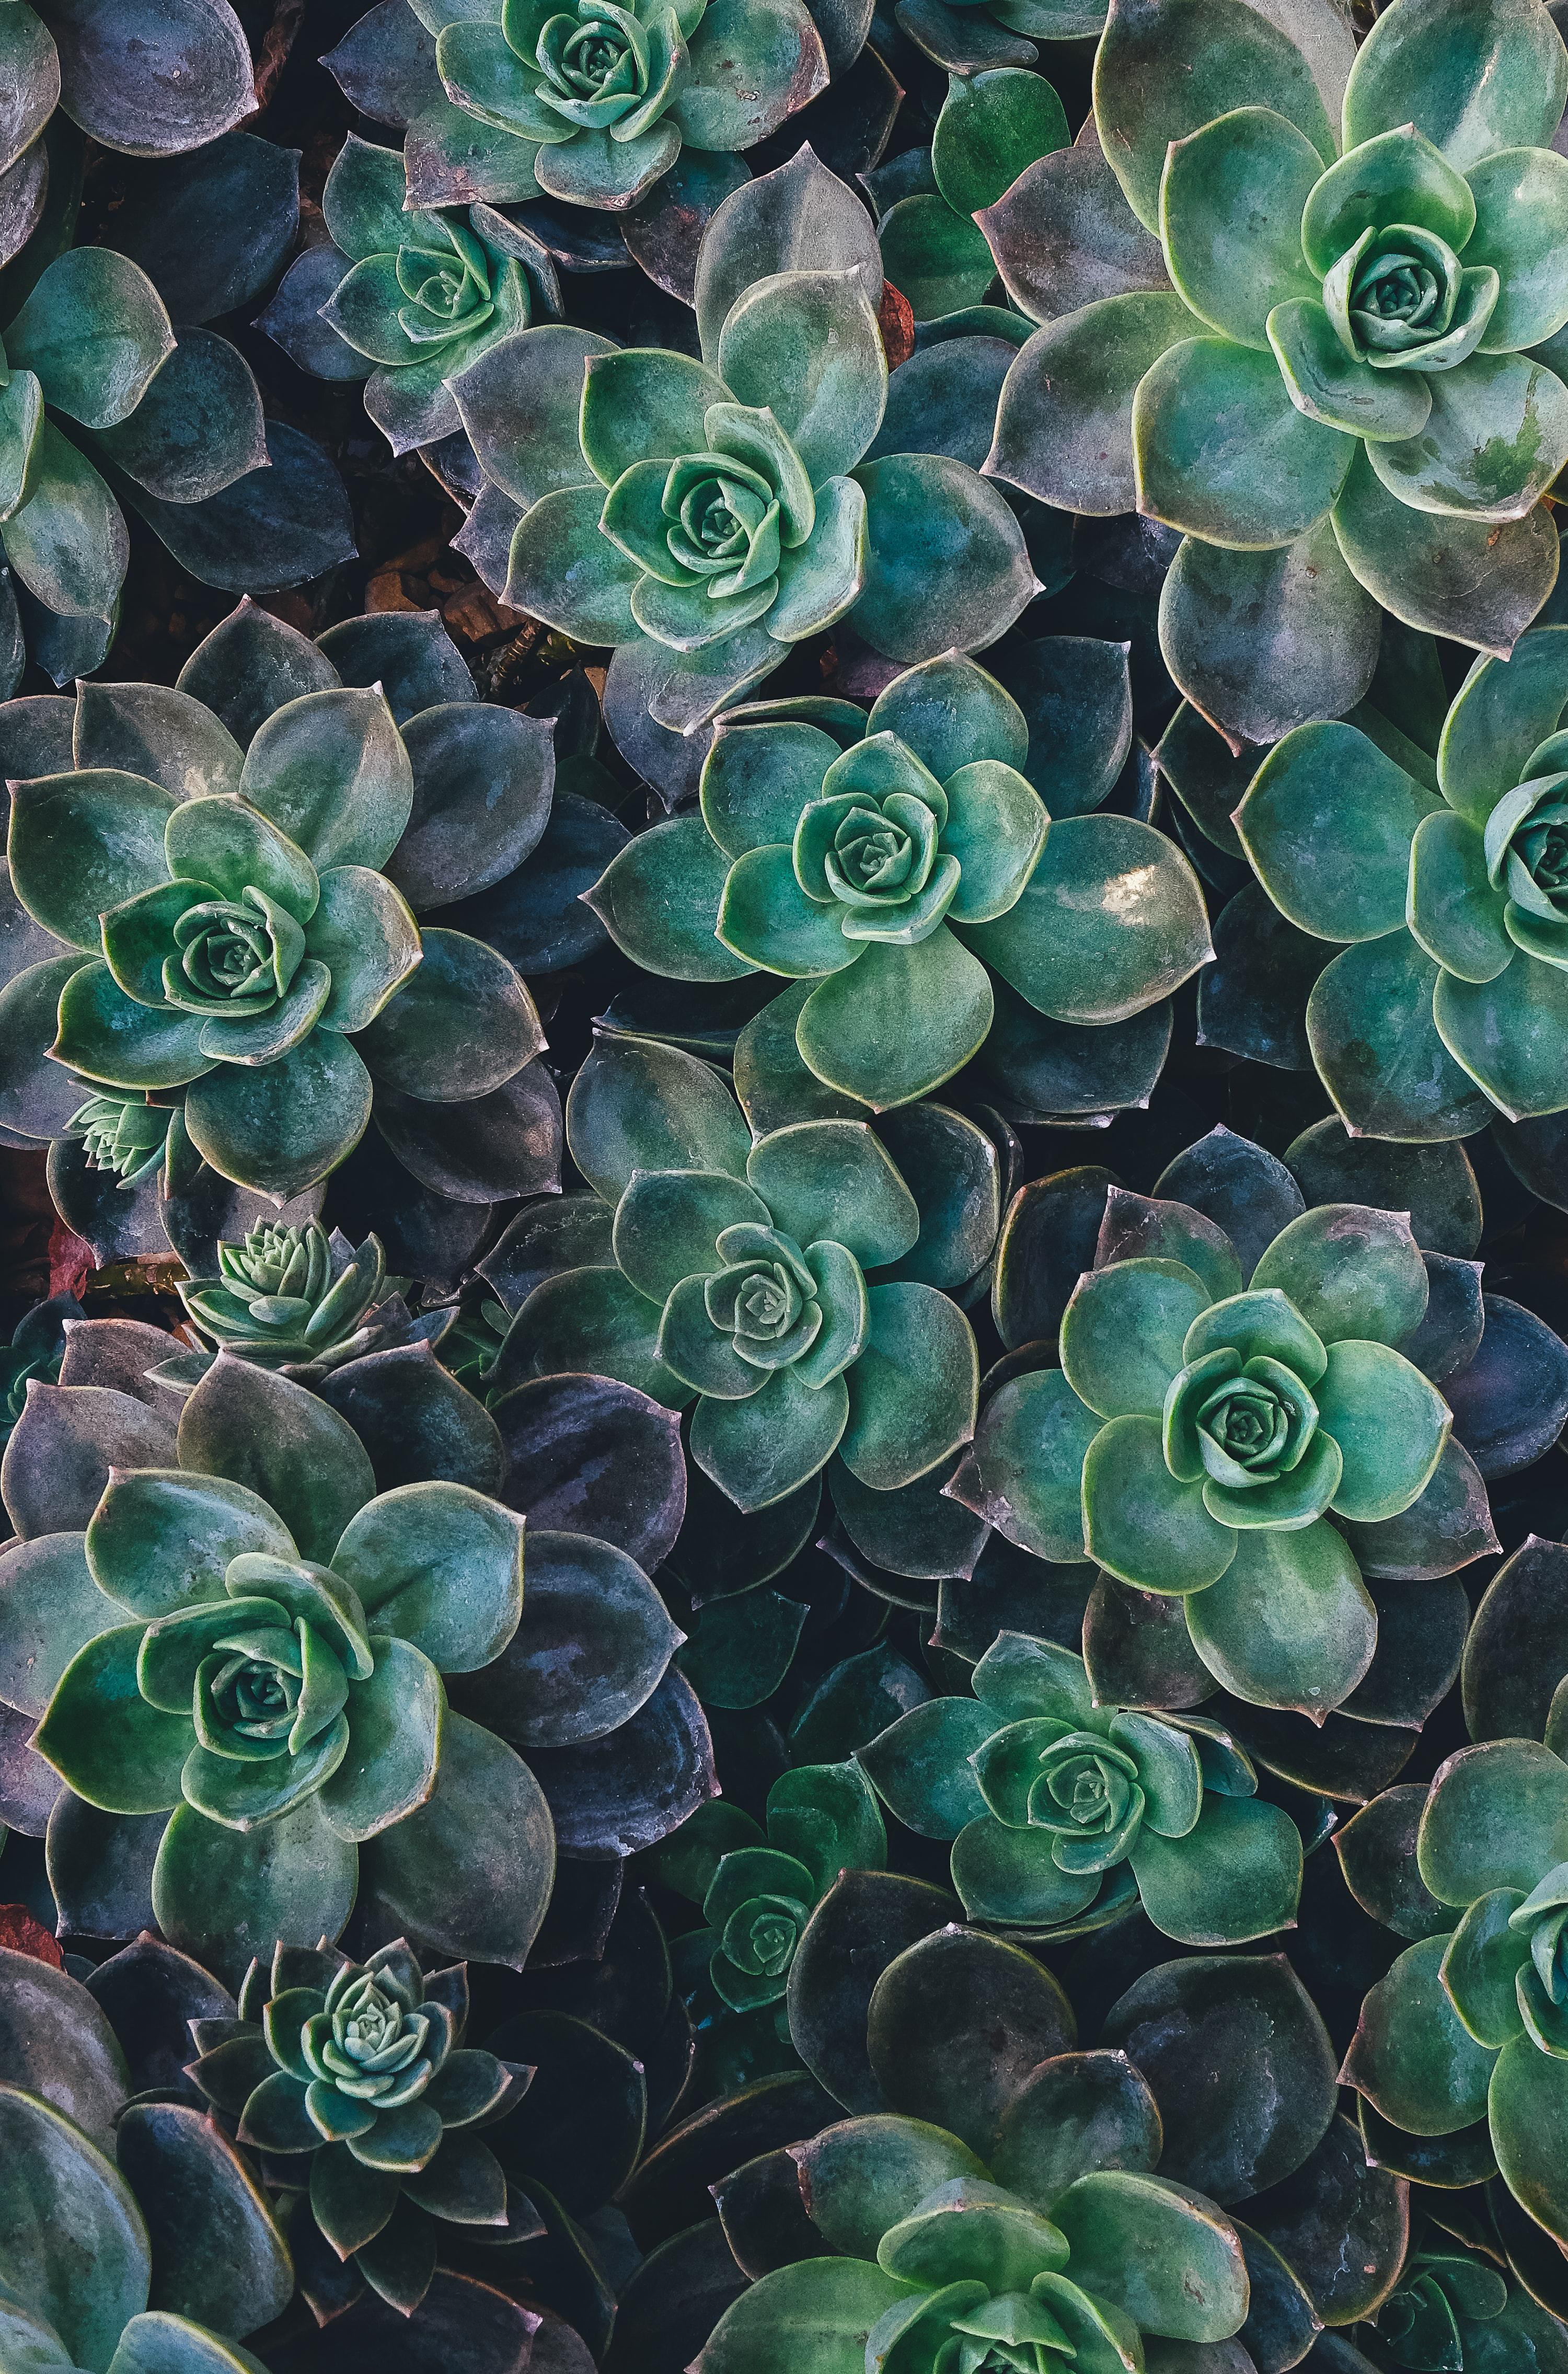 100 Succulent Pictures Download Free Images On Unsplash